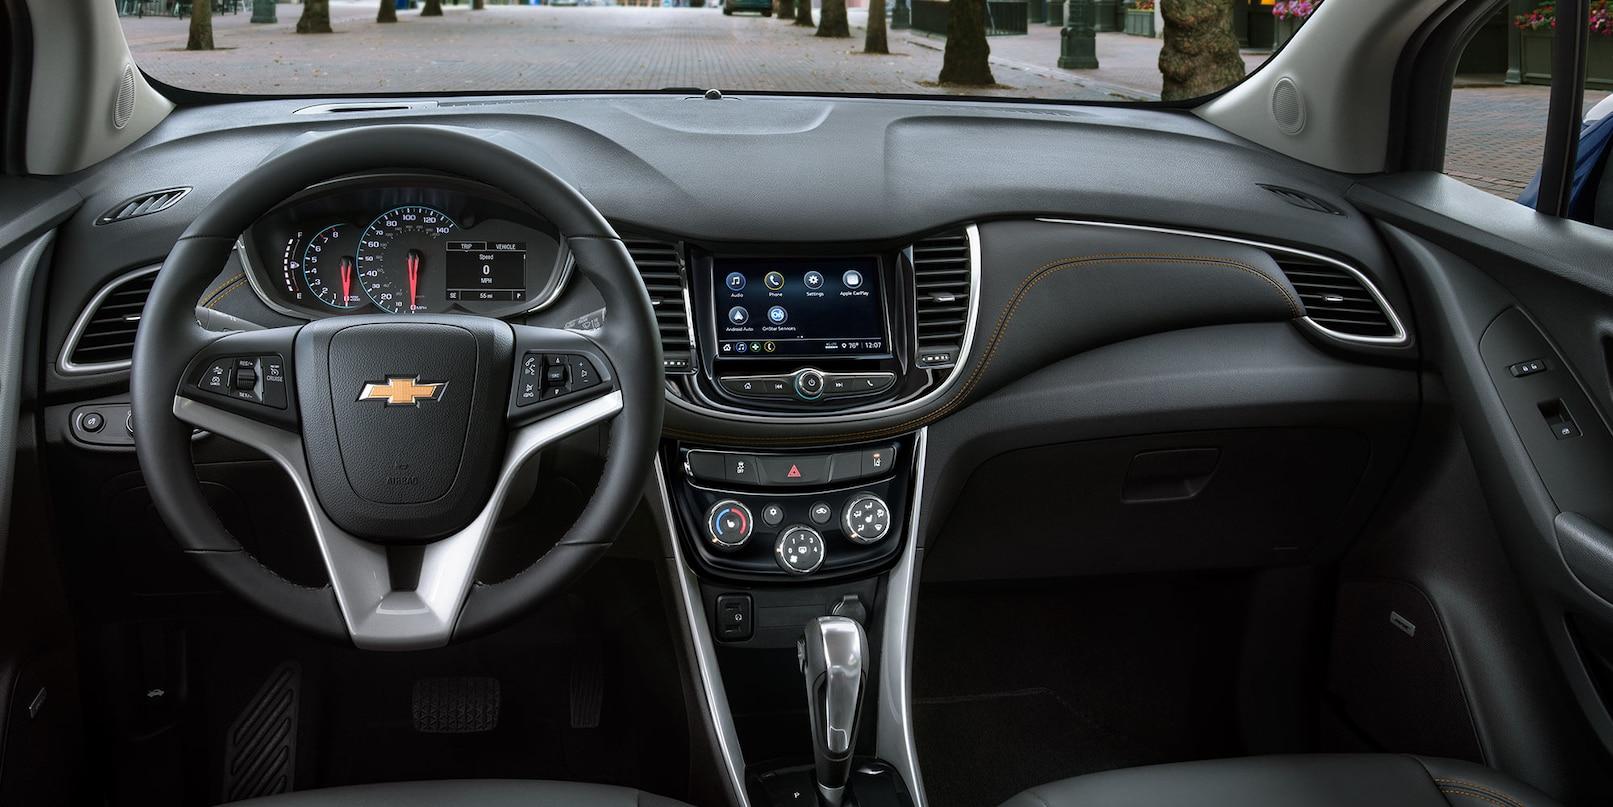 impala previous team dealers okc next oklahoma vehicles chevy chevrolet